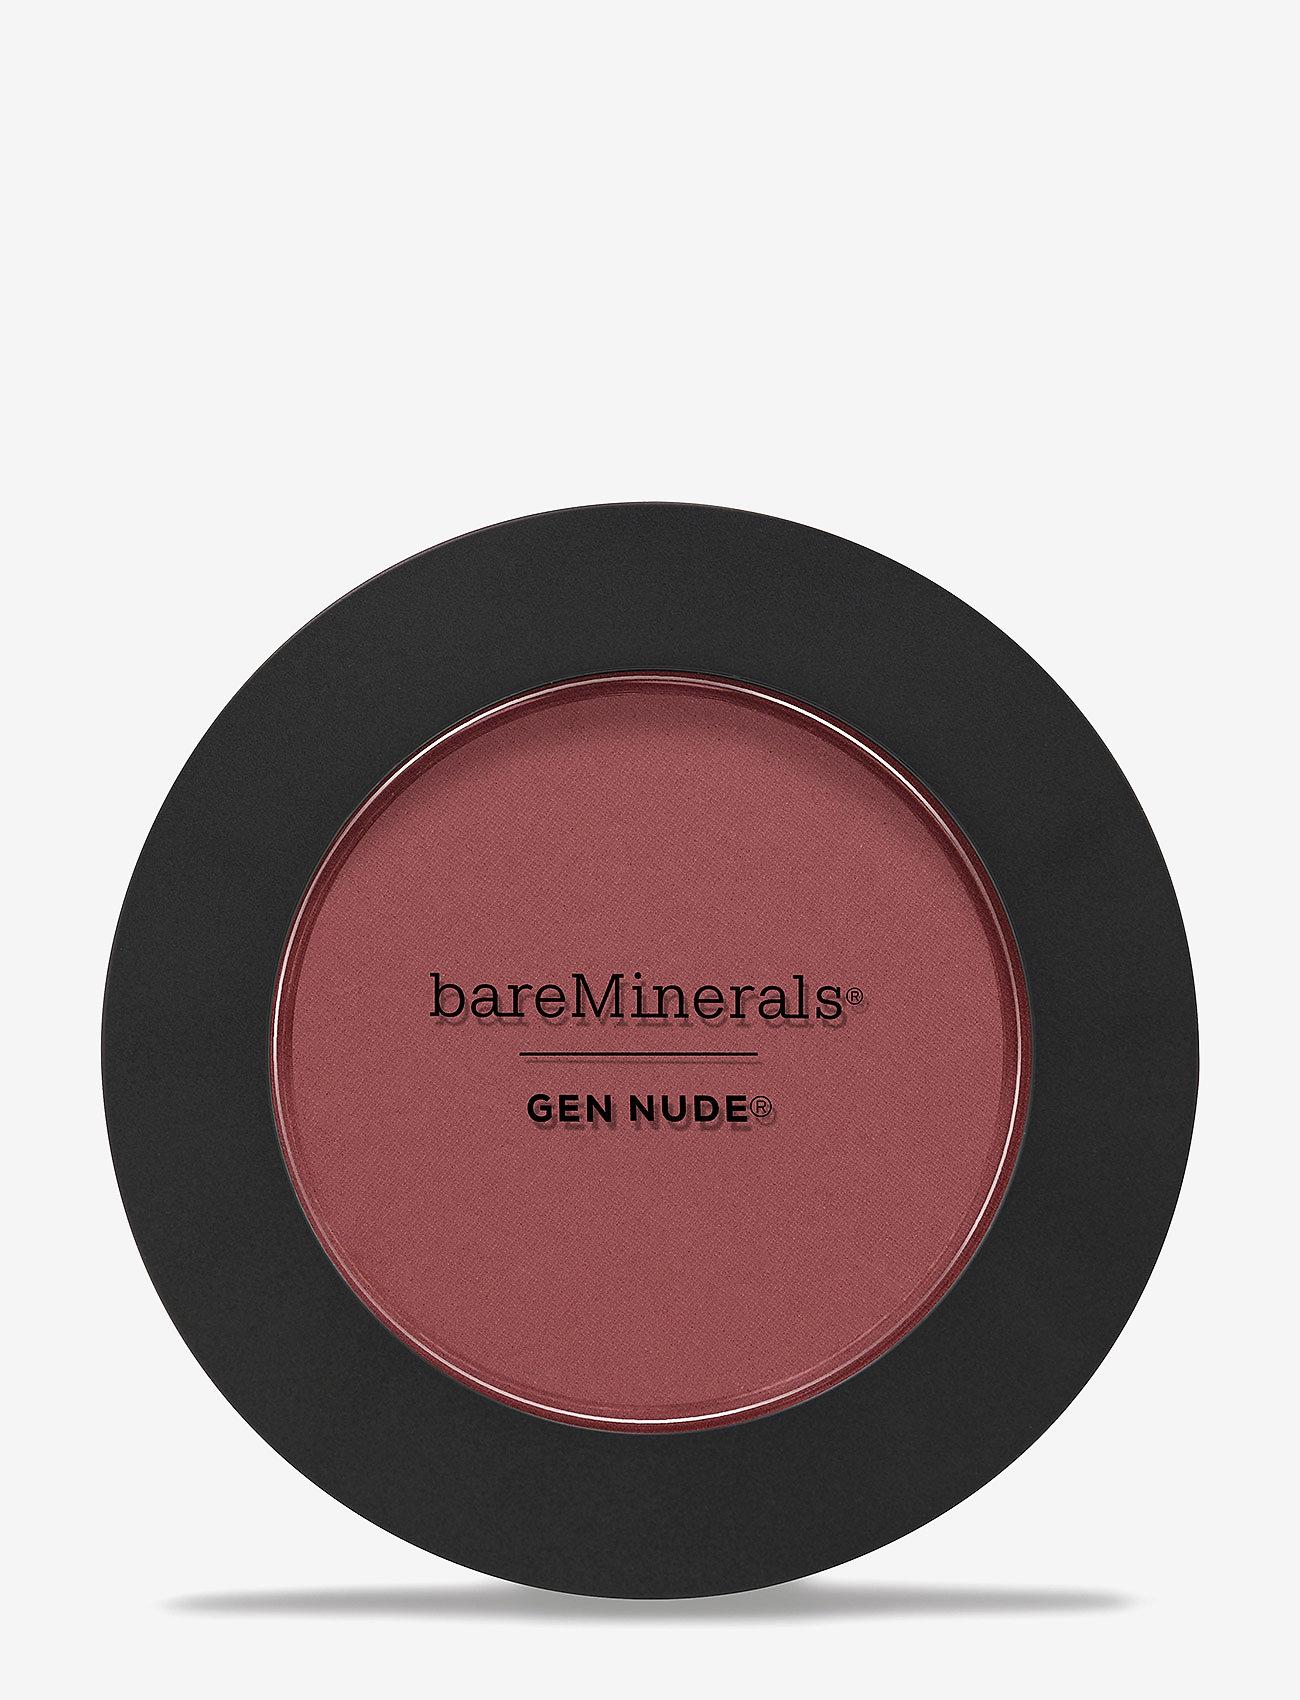 BareMinerals Gen Nude Powder Blush - # You Had Me At